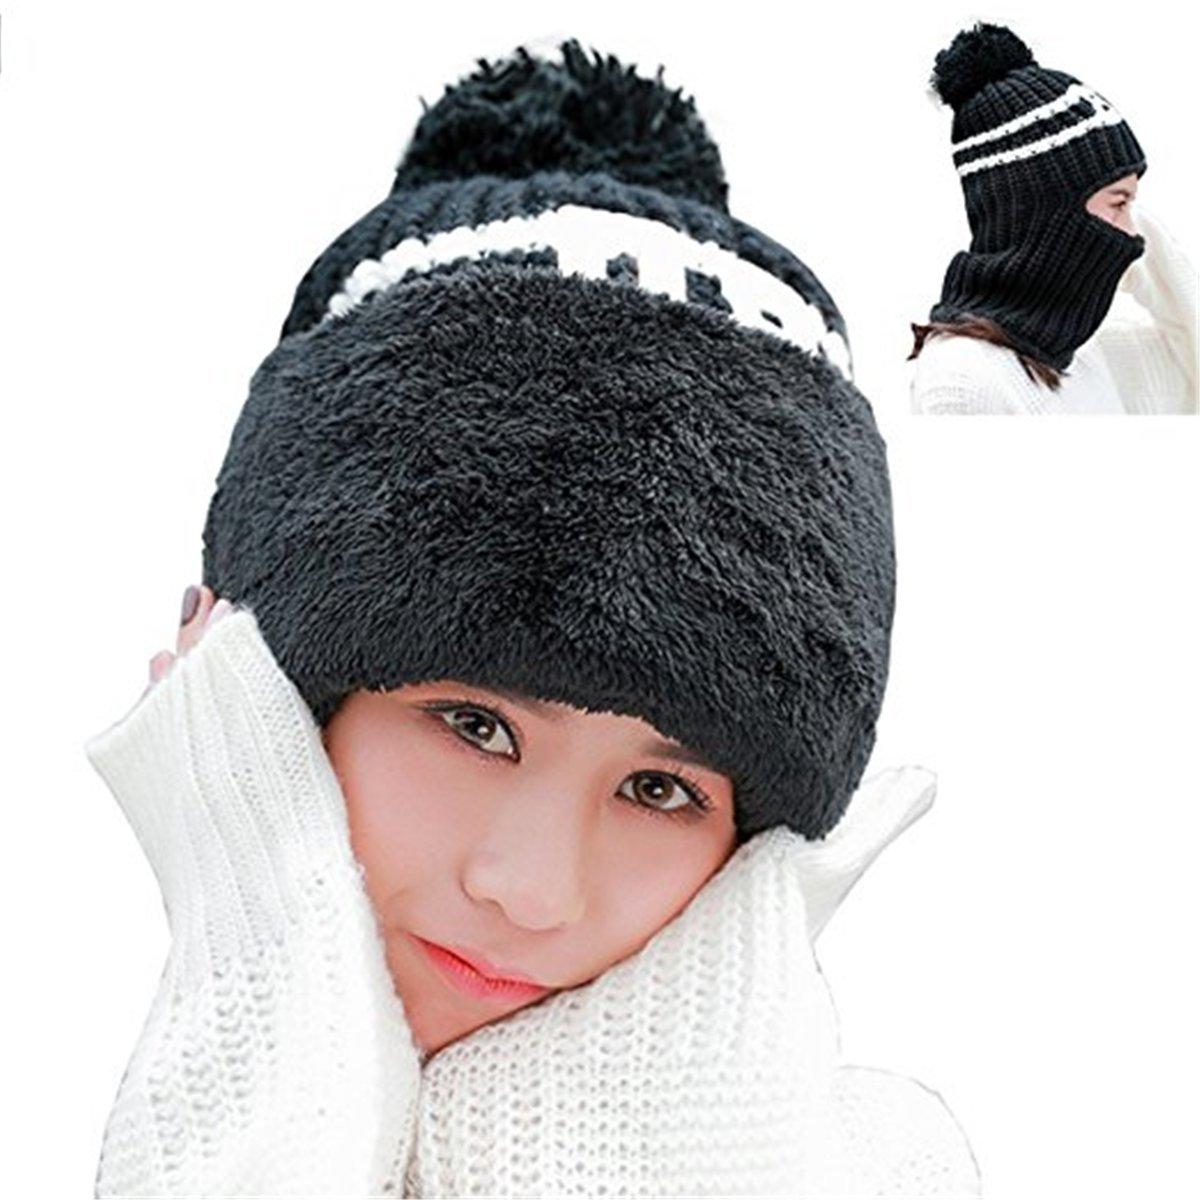 Womens Beanie Hat Fleece Lined Knit Winter Skull Cap Cuff Beanie